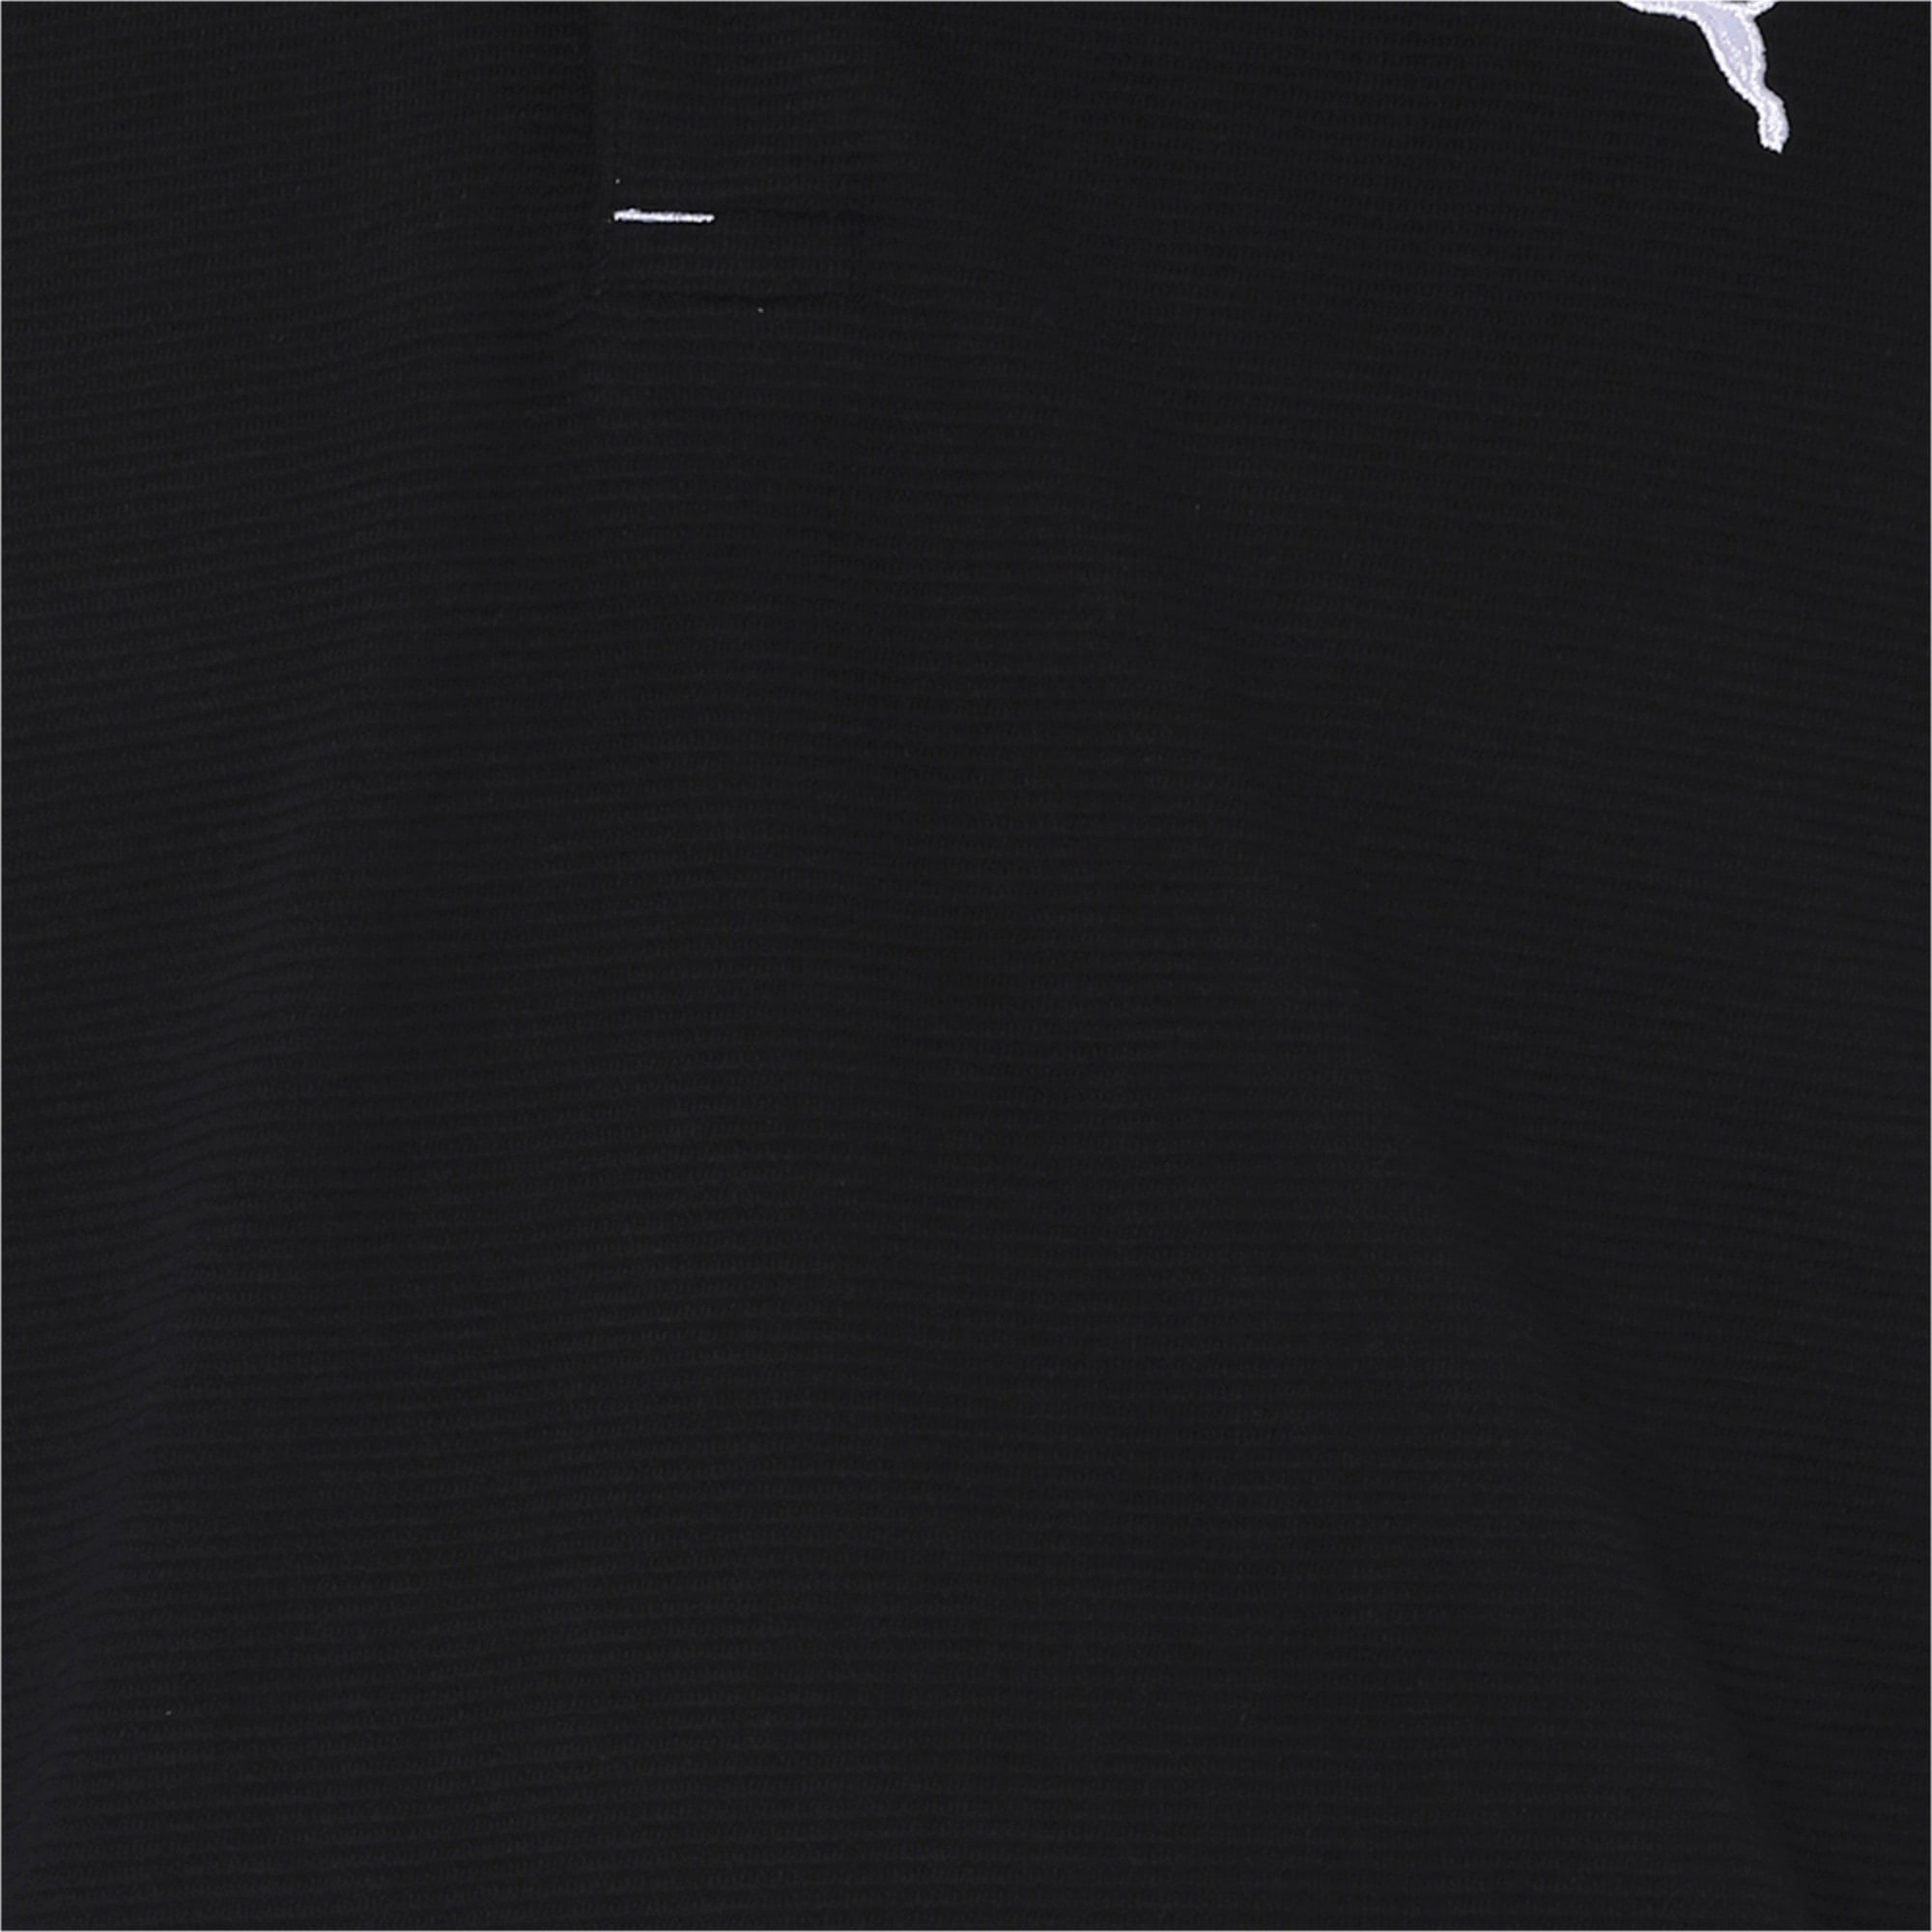 Thumbnail 6 of one8 Men's Stylised Polo, Puma Black Heather, medium-IND